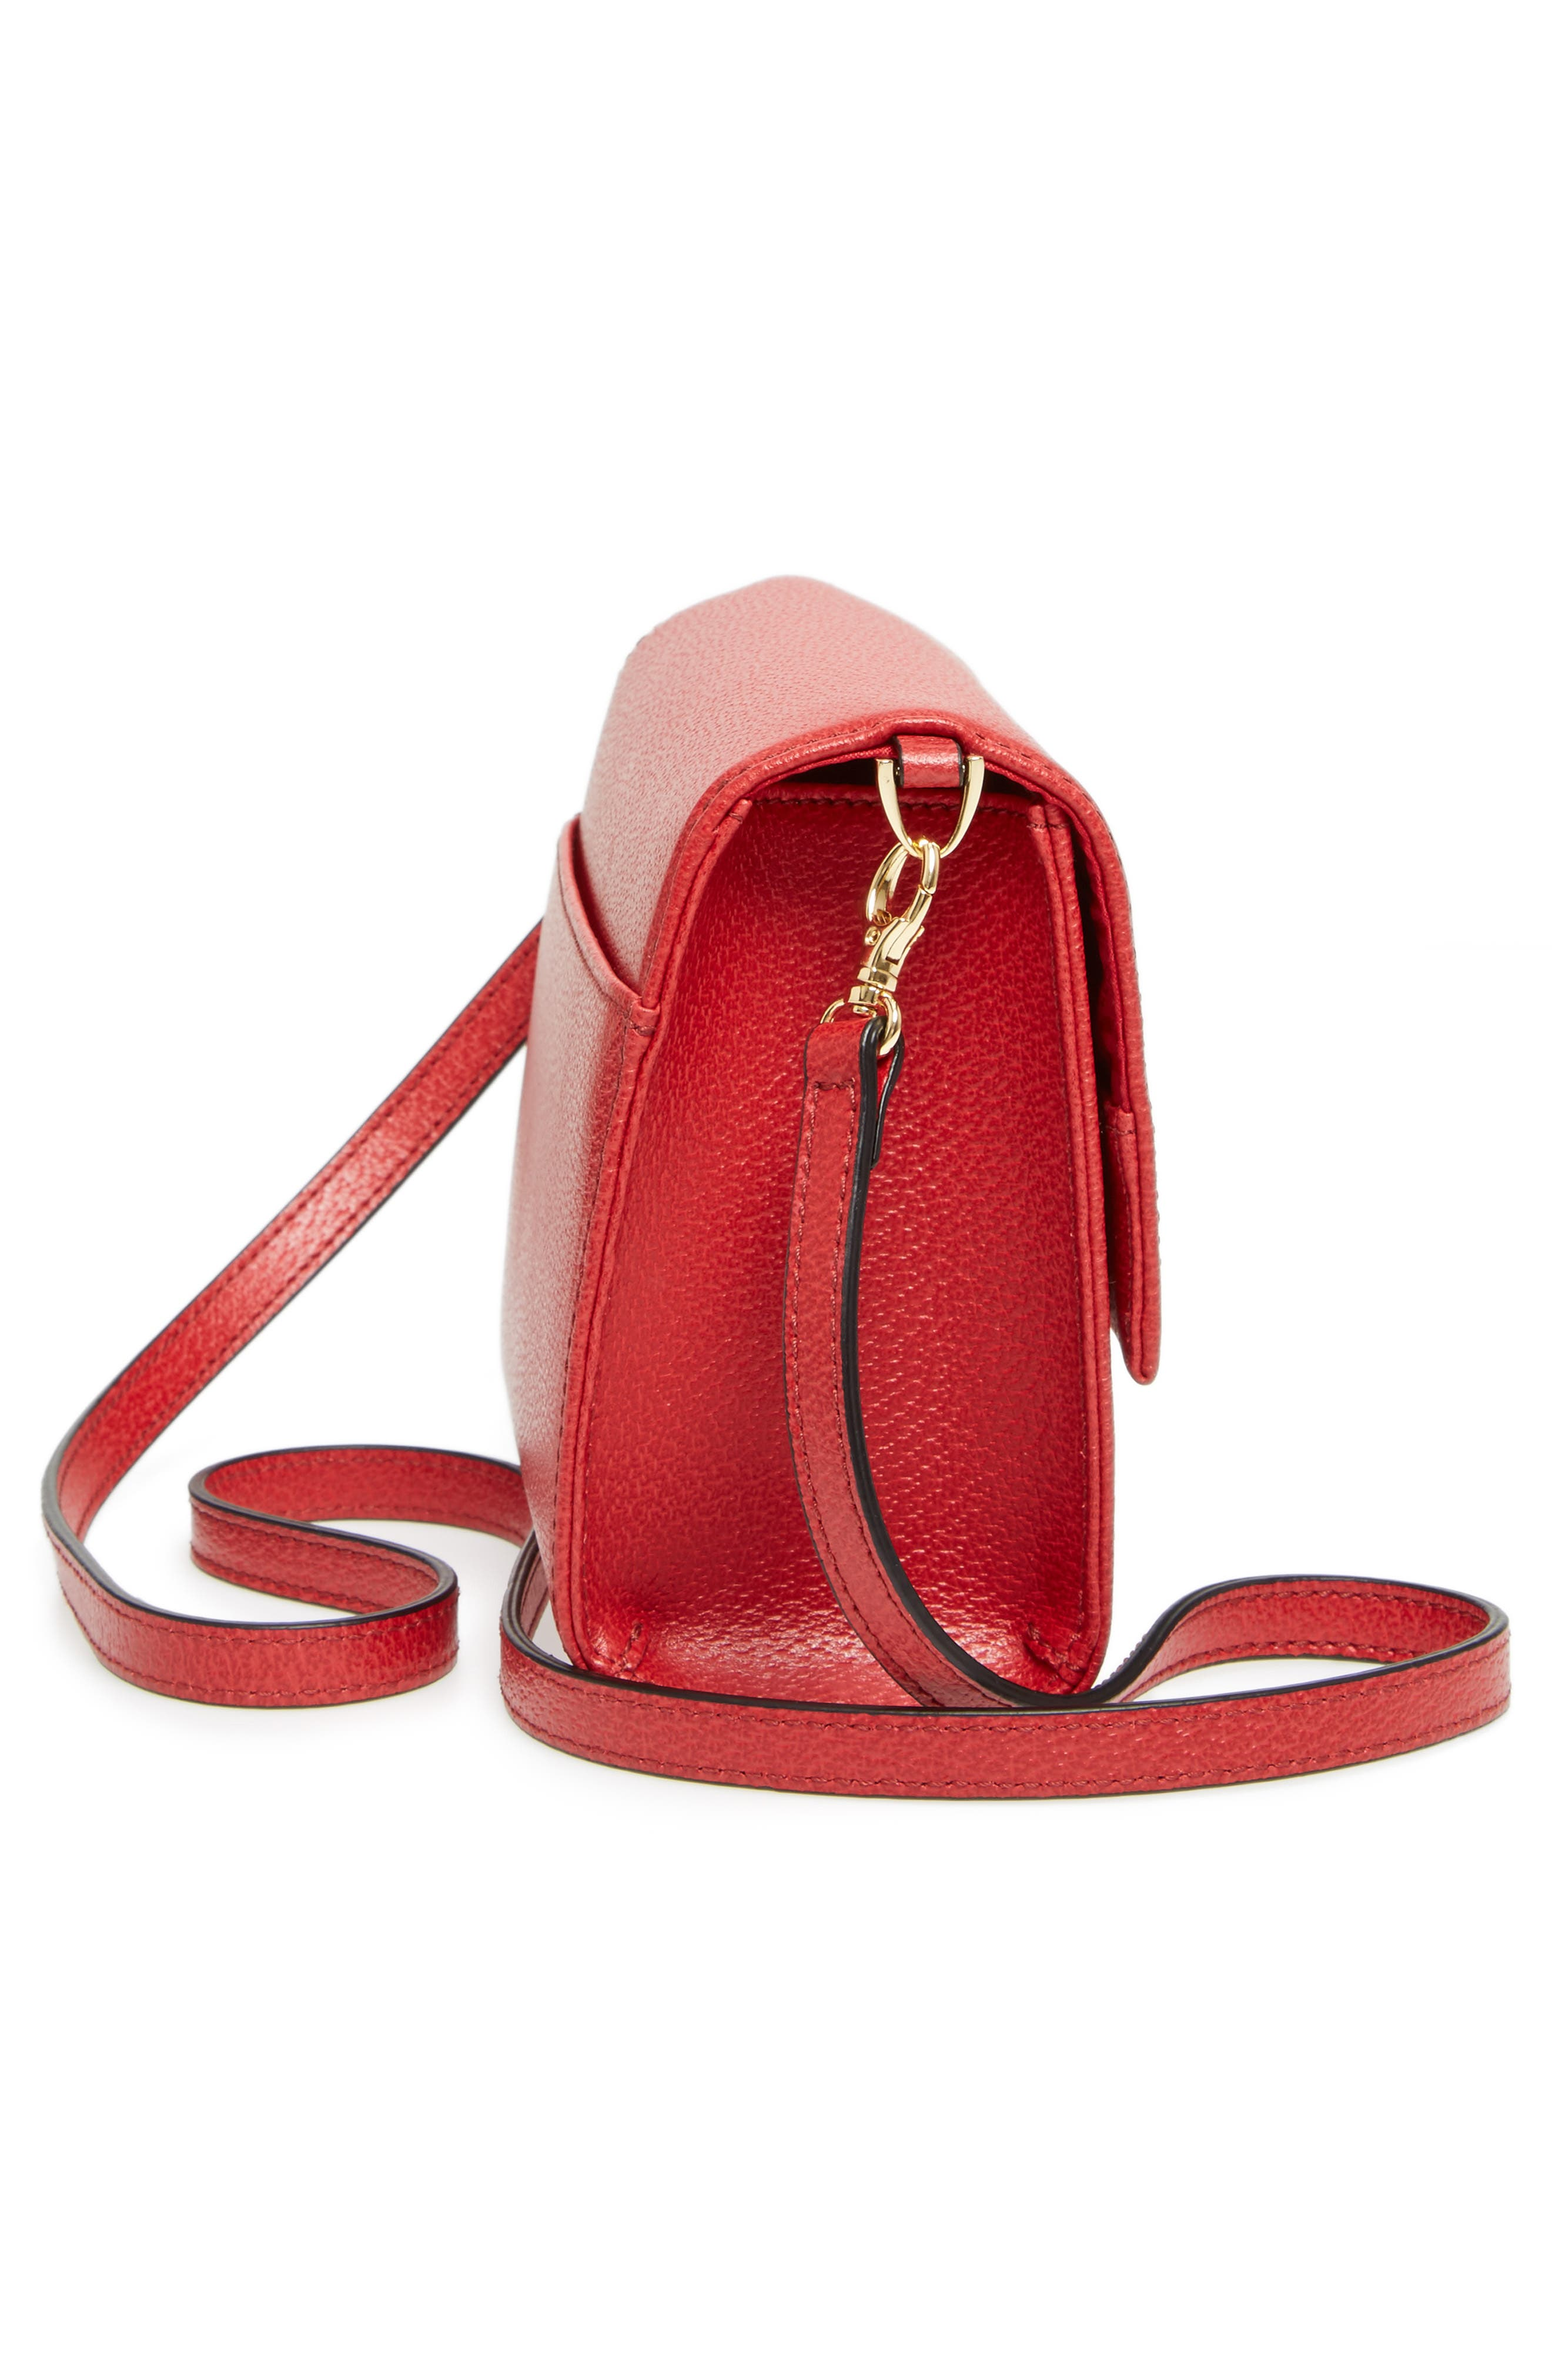 LODIS Stephanie Under Lock & Key - Small Eden Leather Crossbody Bag,                             Alternate thumbnail 5, color,                             600